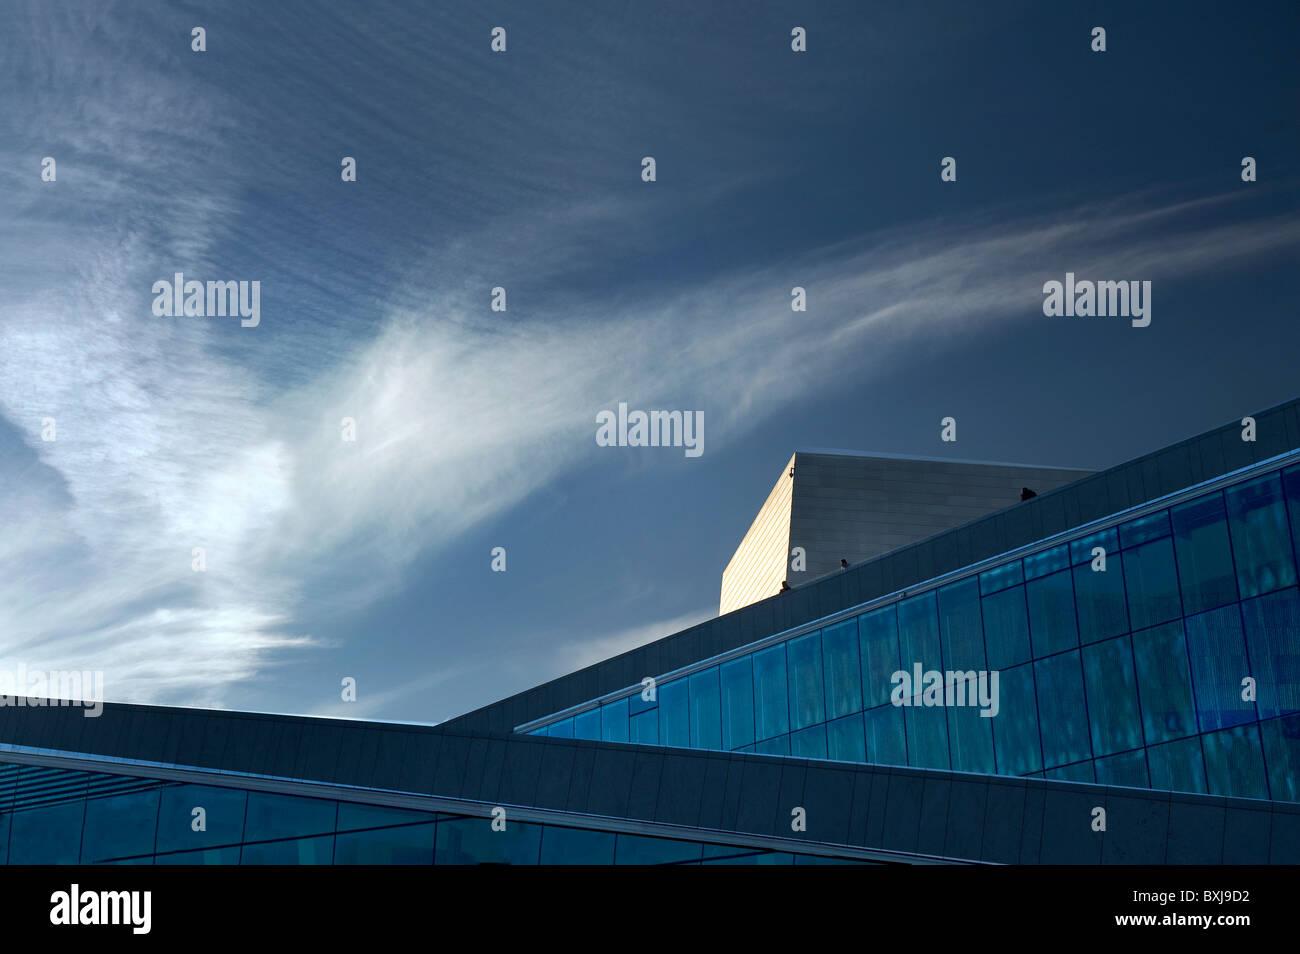 Scenic view of Oslo Opera Norway - Stock Image